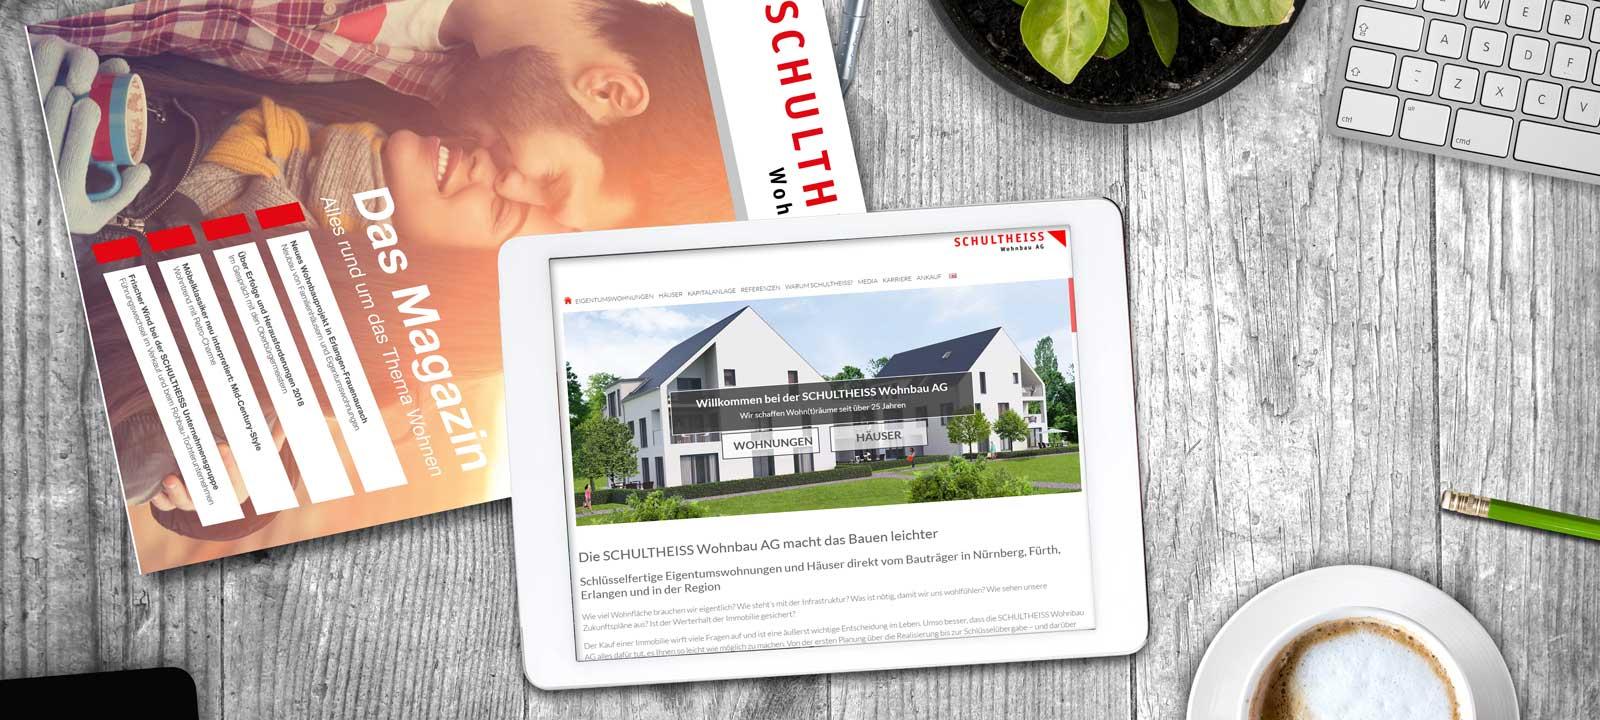 Schultheiss Wohnbau immobilien magazin nürnberg schultheiss wohnbau ag